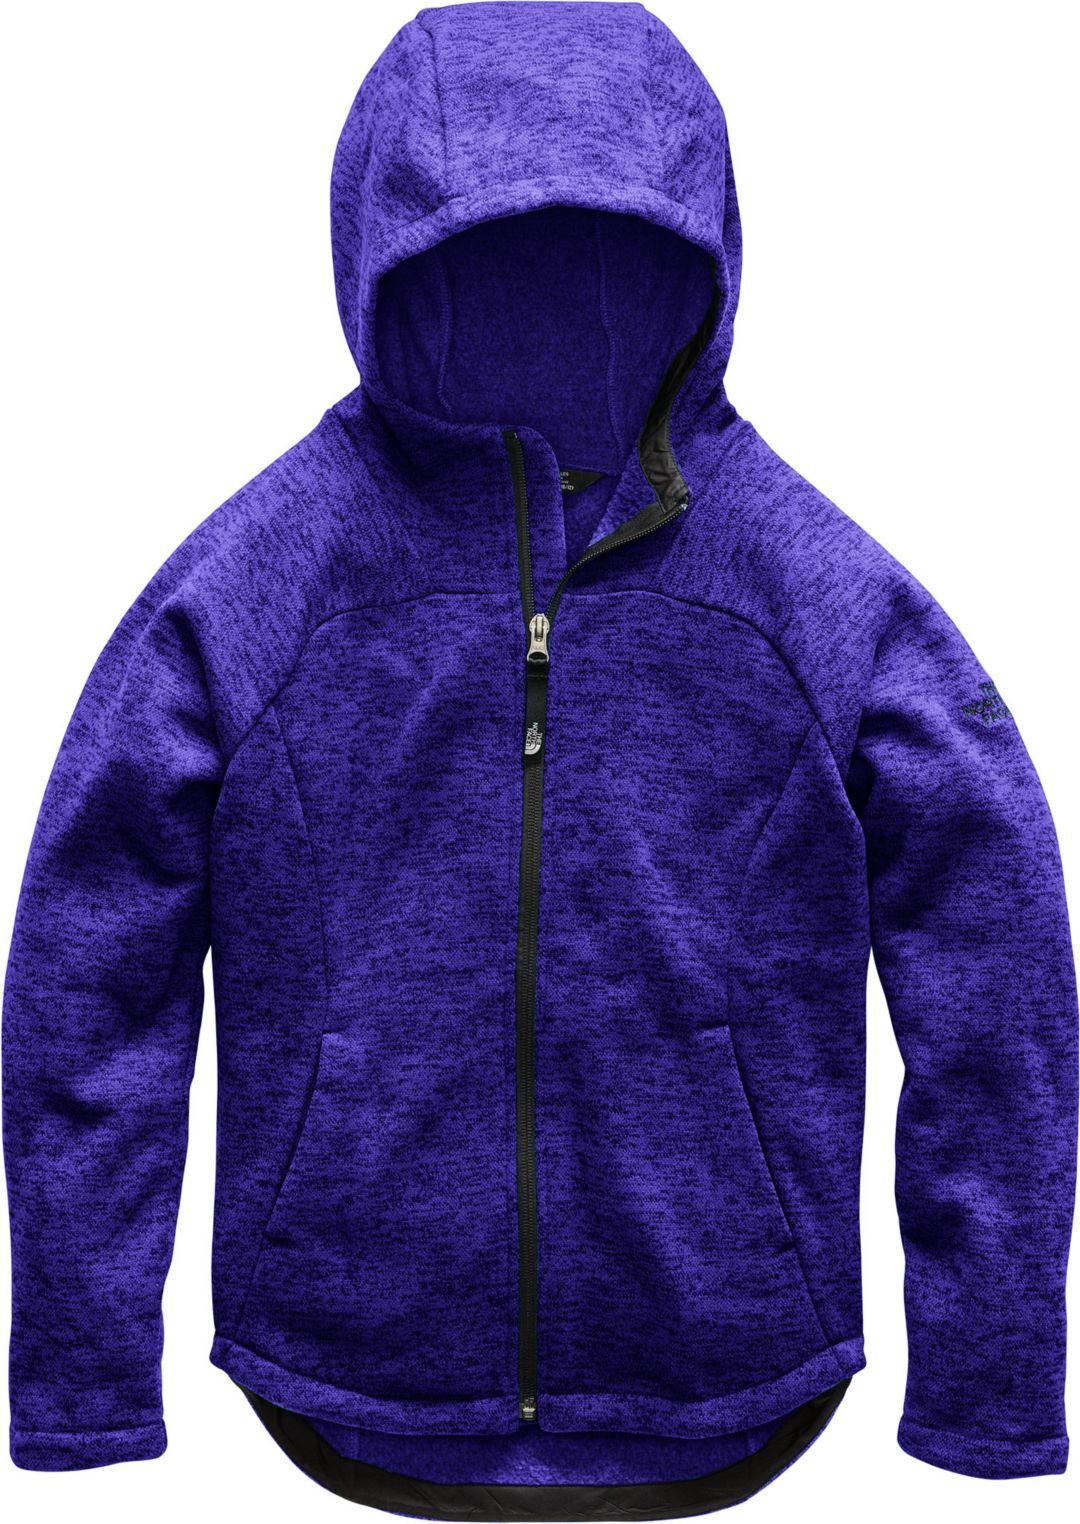 5ff7026bc The North Face Girls' Indi Fleece Full Zip Jacket